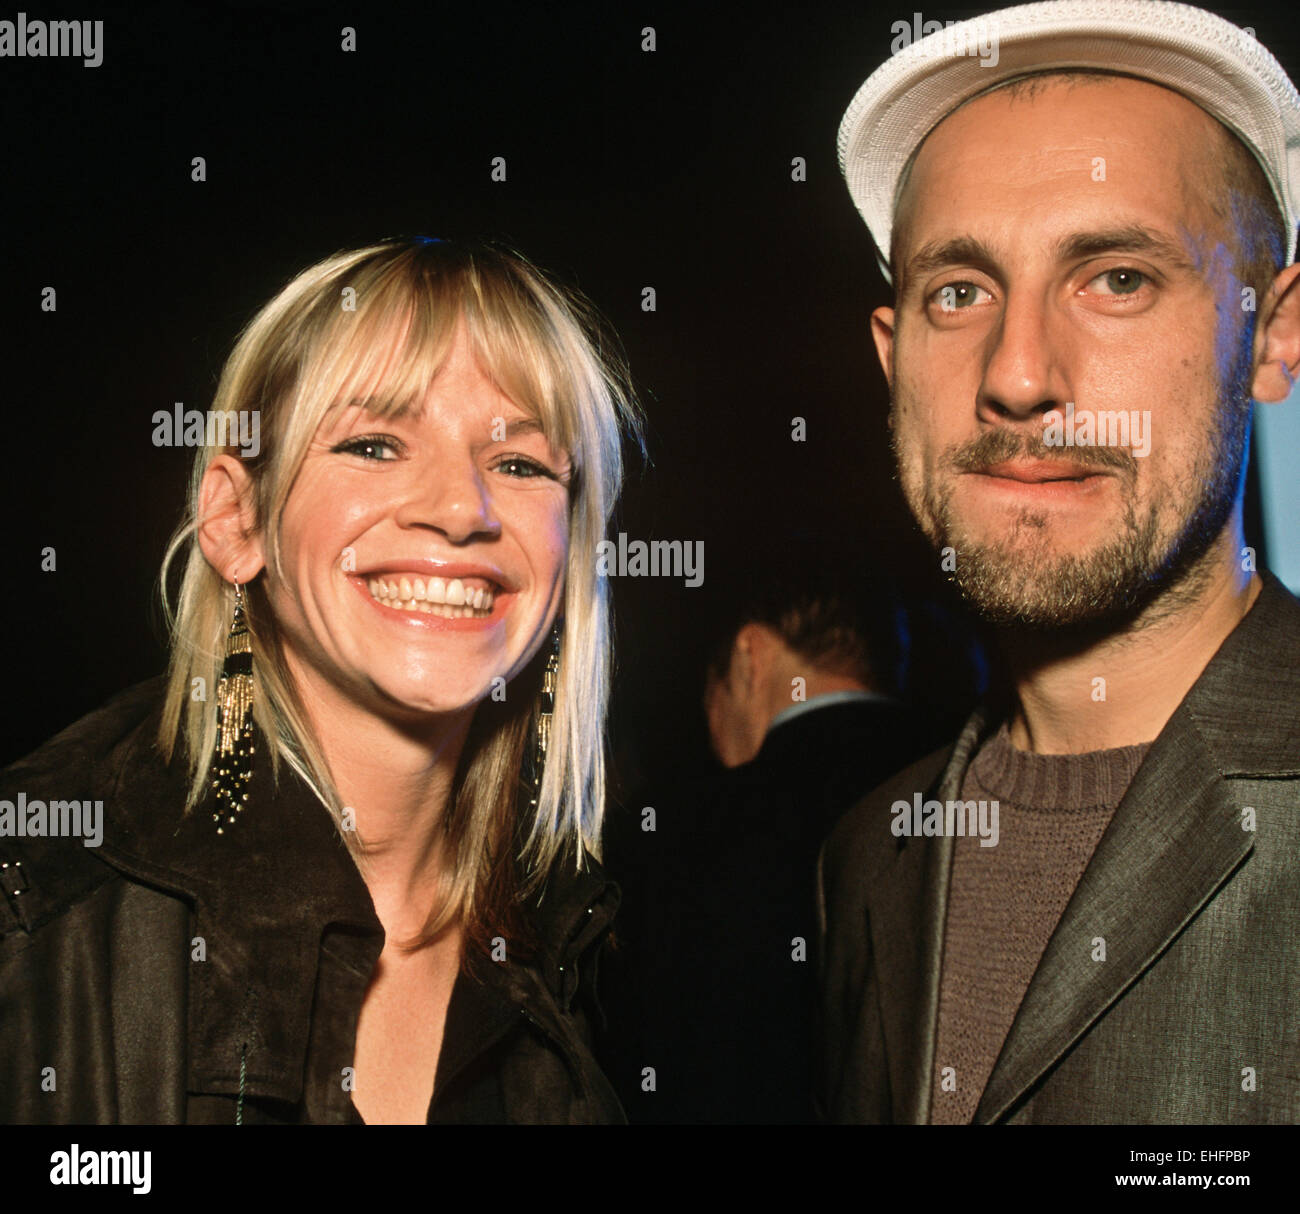 Zoe Ball & Dan Pepe - Stock Image